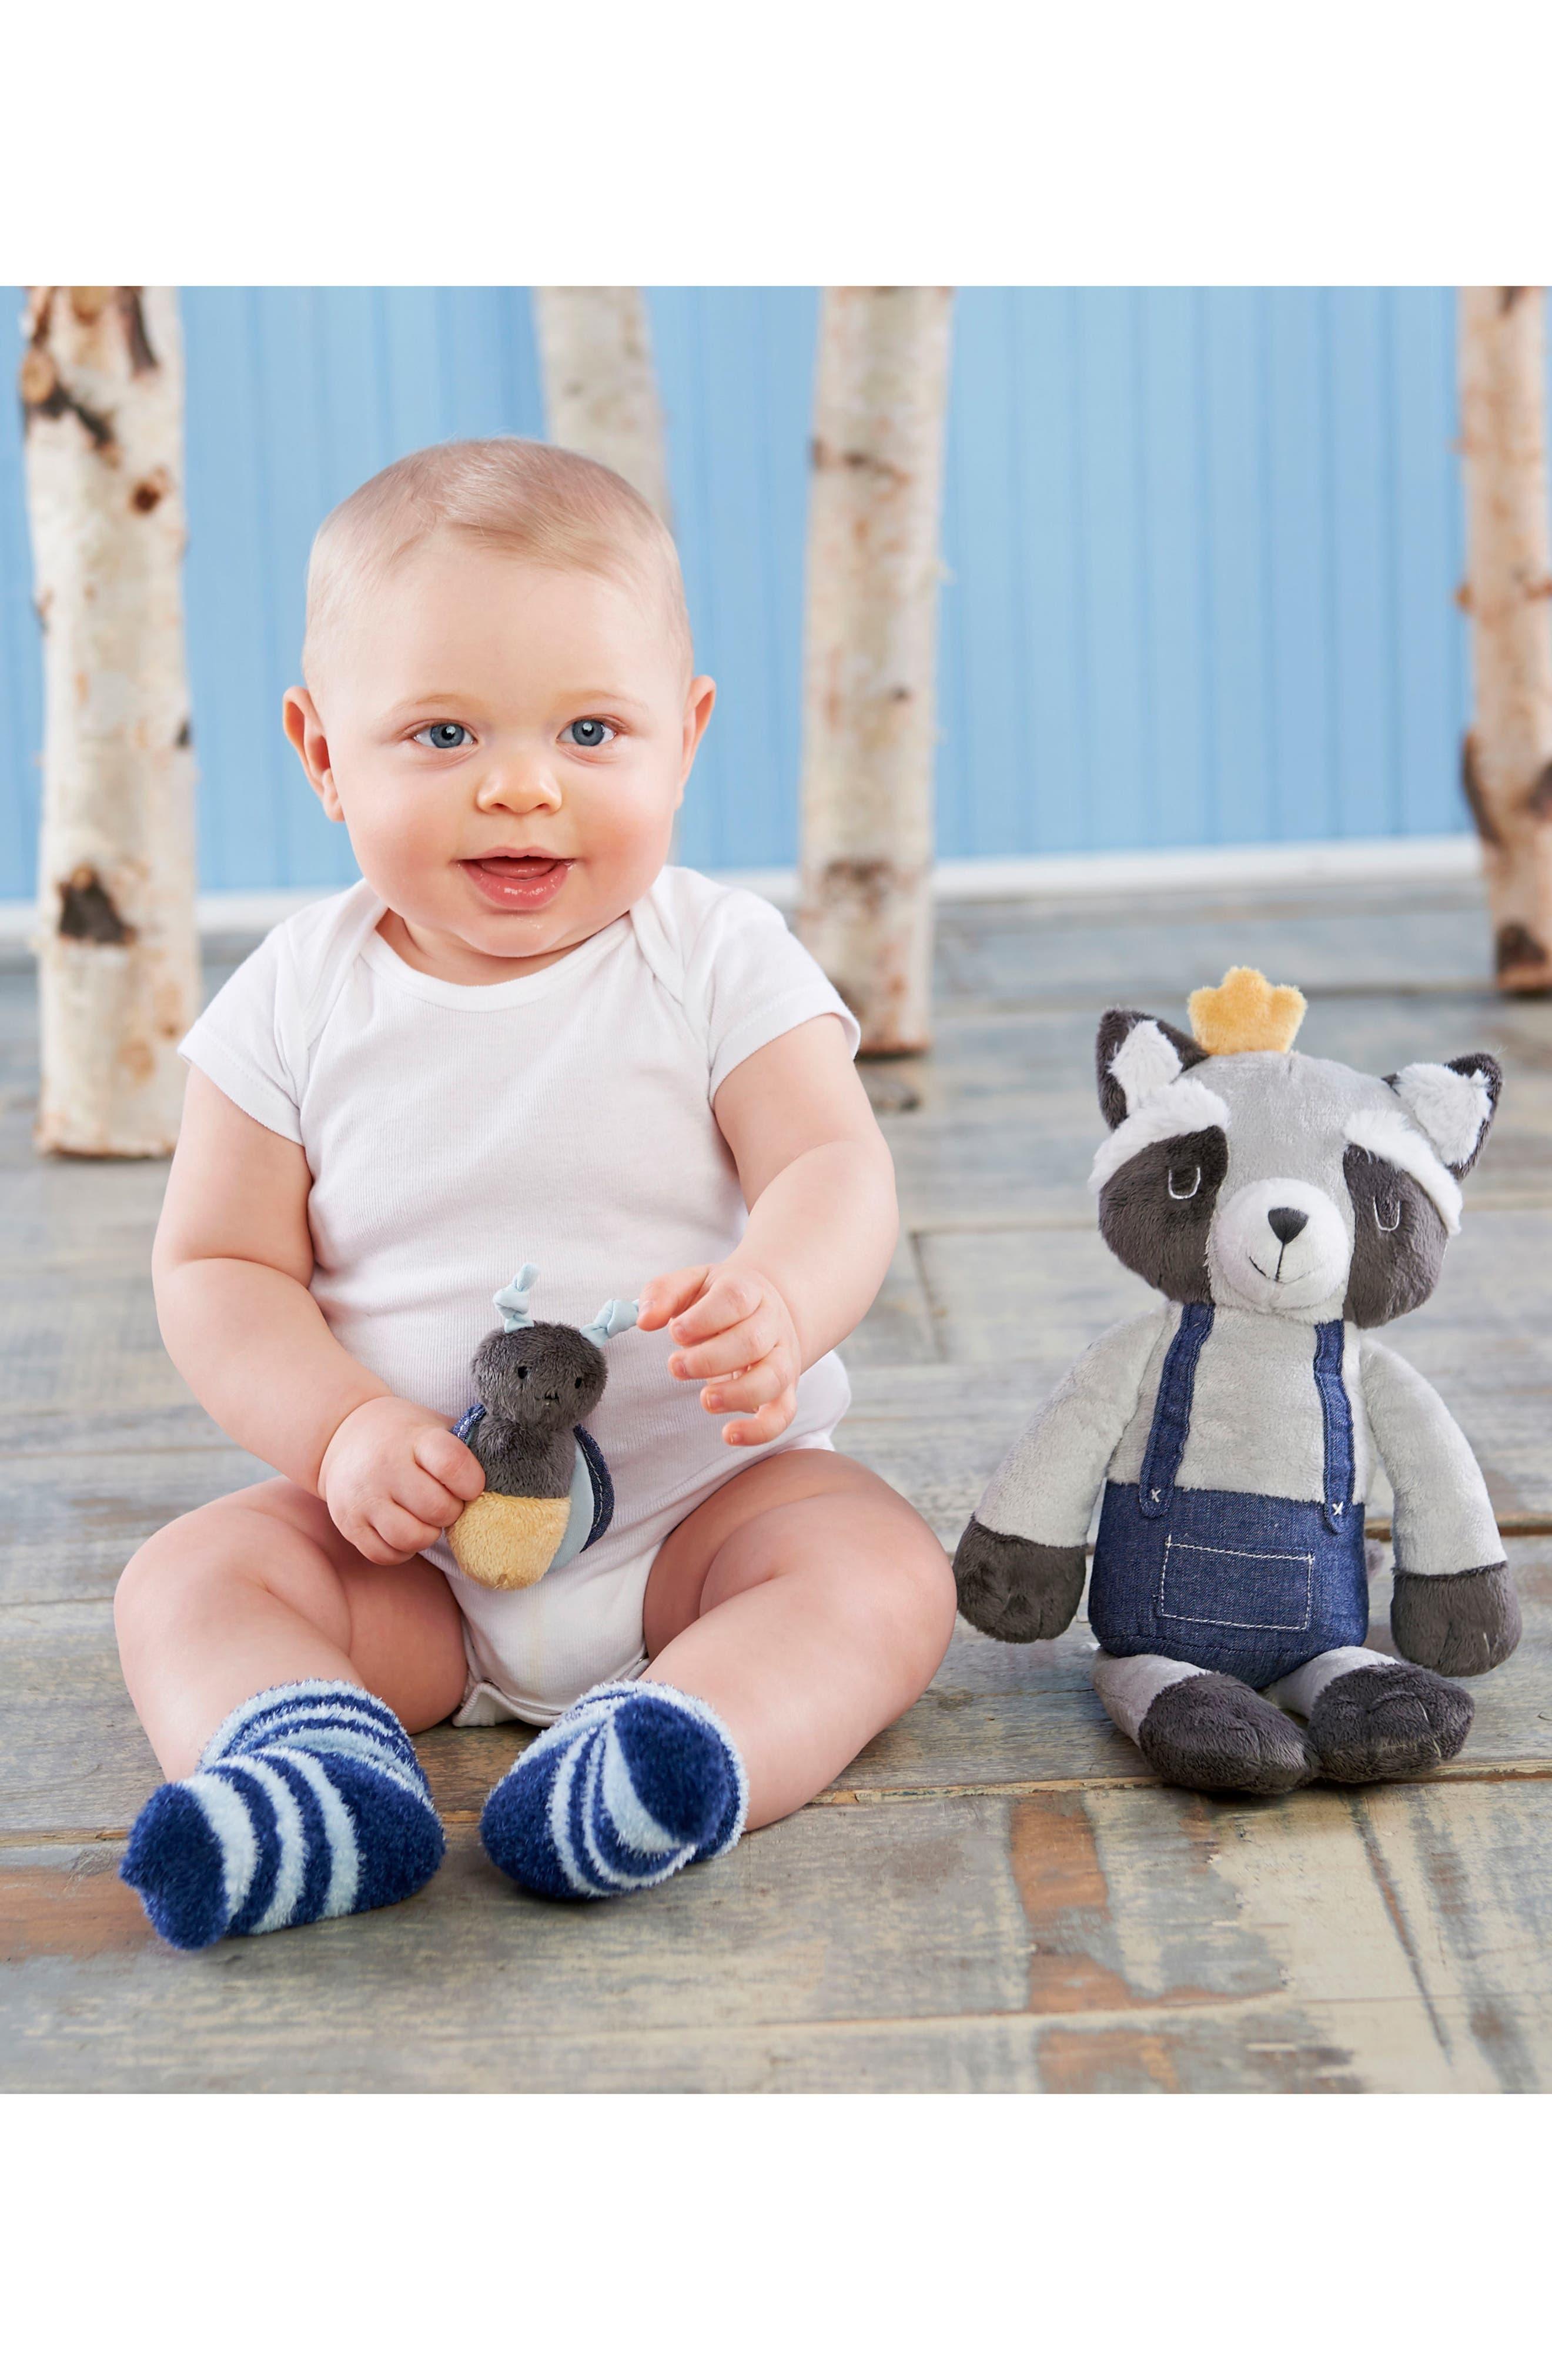 Alternate Image 2  - Baby Aspen Forest Friends Raccoon Plush Robe, Fuzzy Socks, Stuffed Animal & Rattle Set (Baby)